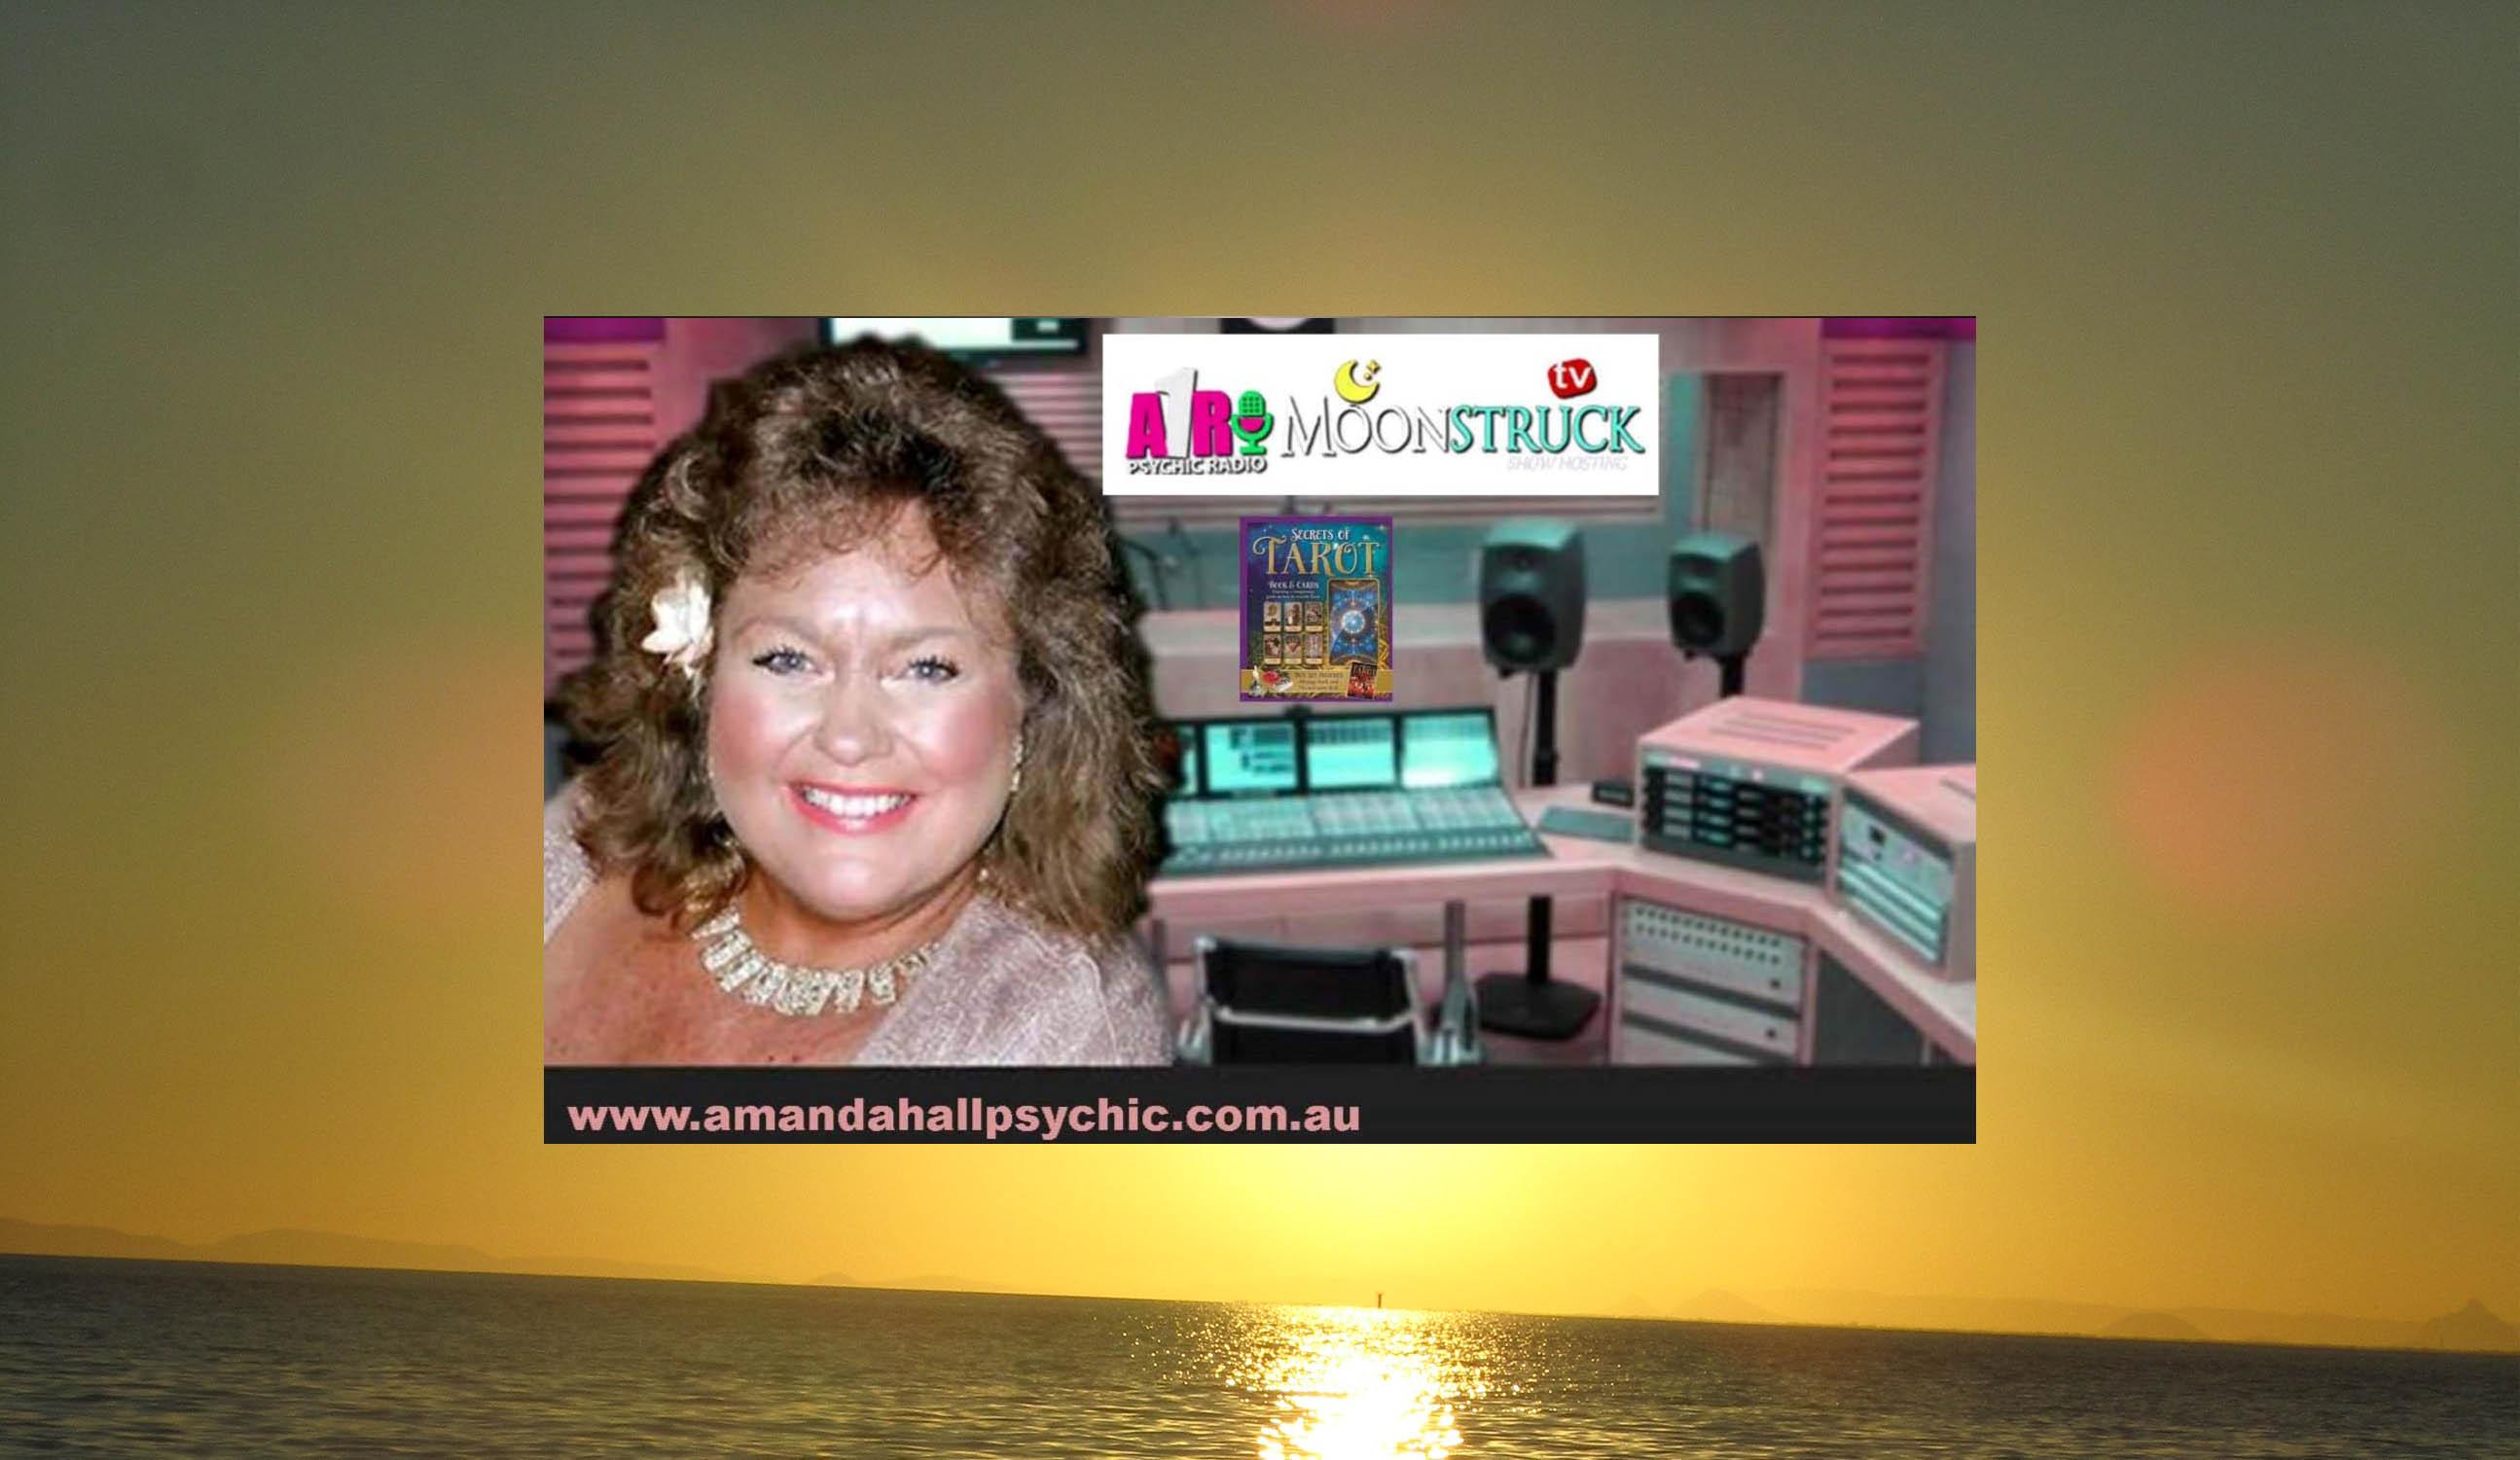 Amanda-hall-radio